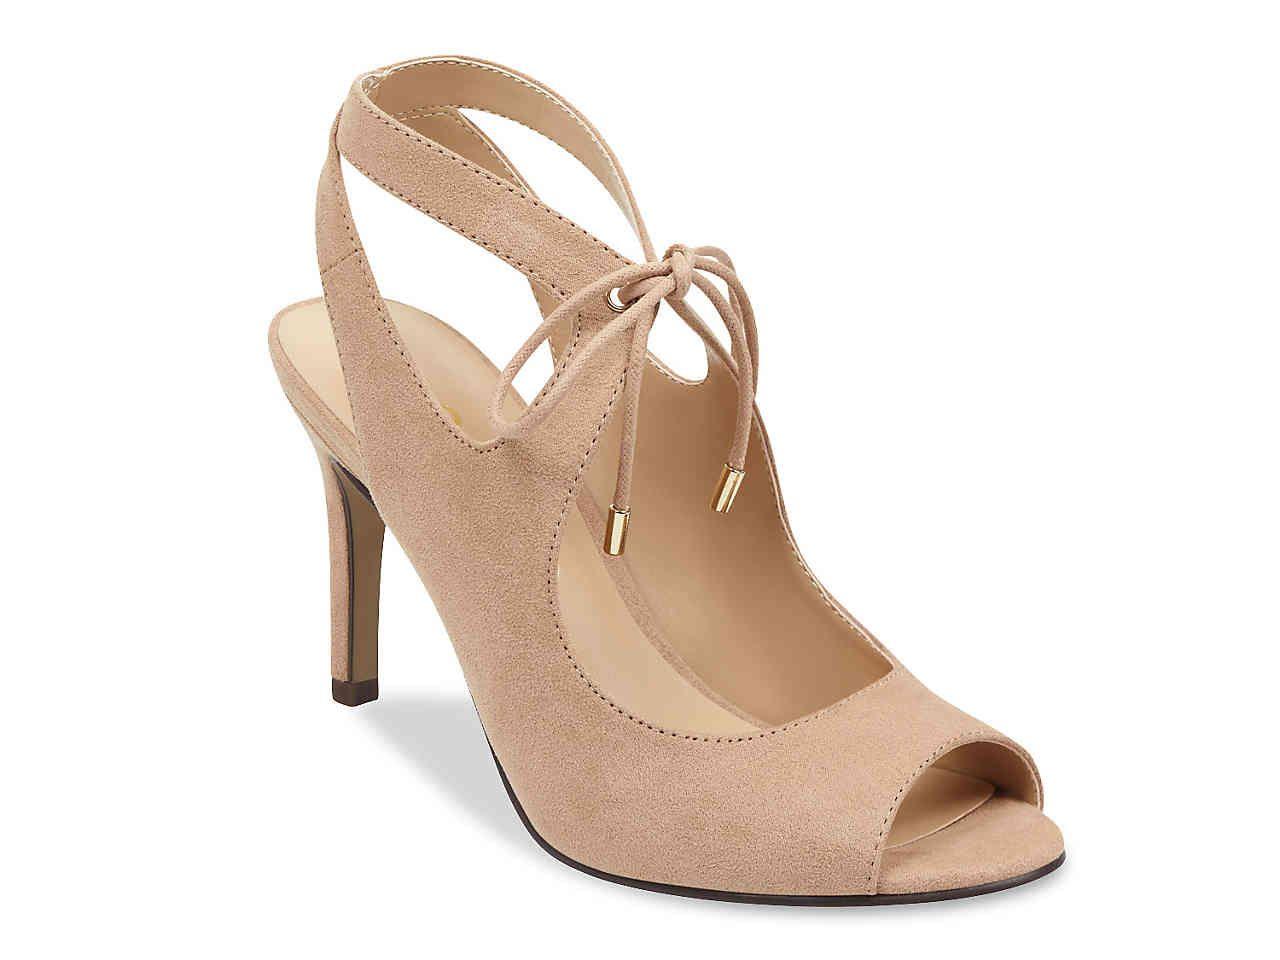 Unisa Marris Sandal | Open toed heels